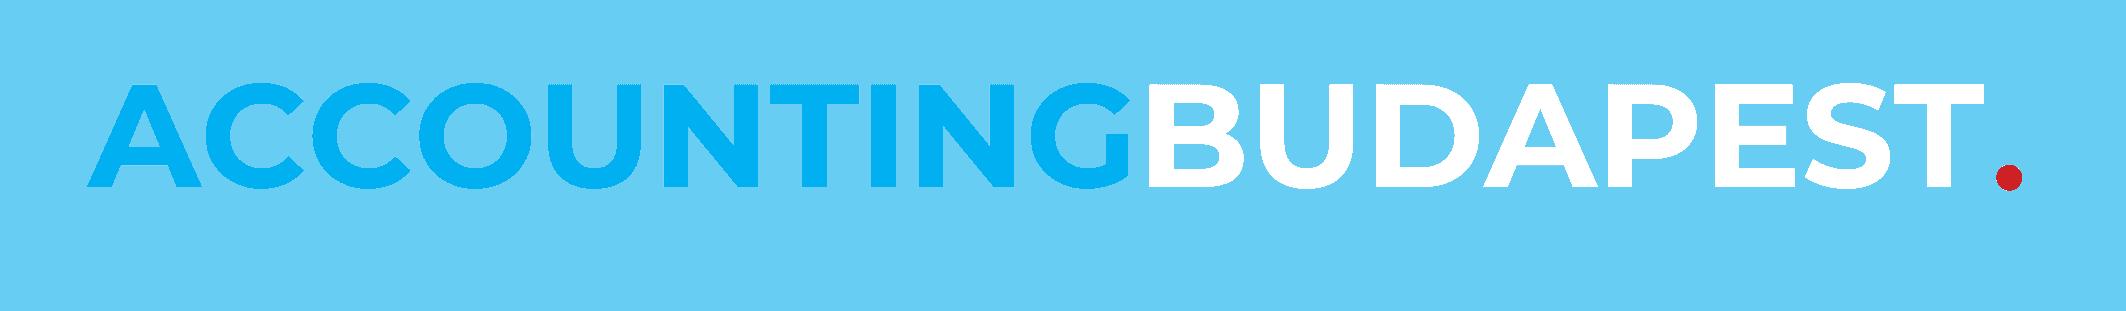 AccountingBudapest Logo